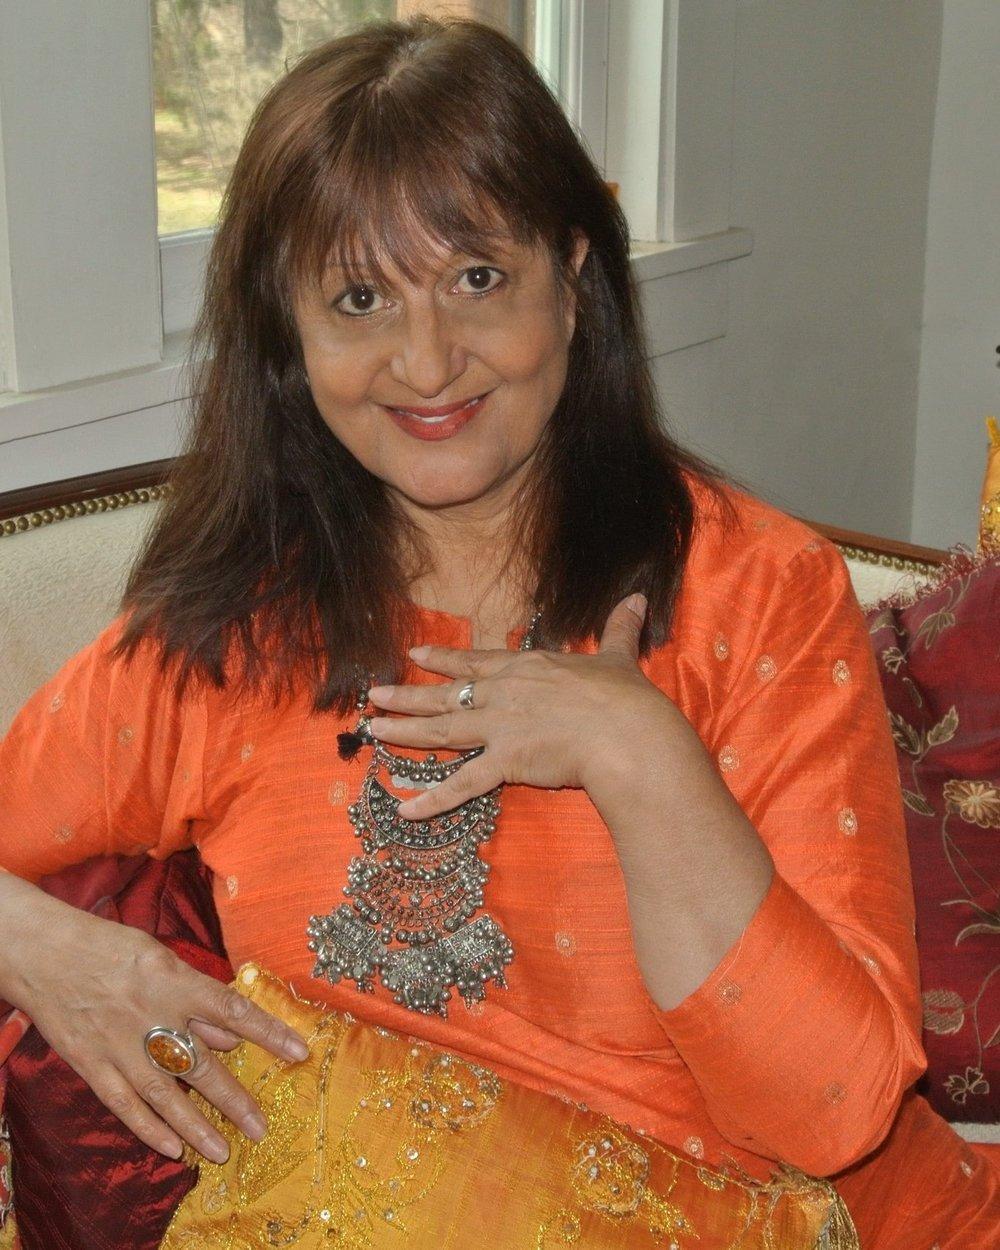 Amber%2B%2BIndia%2Bimage.jpg